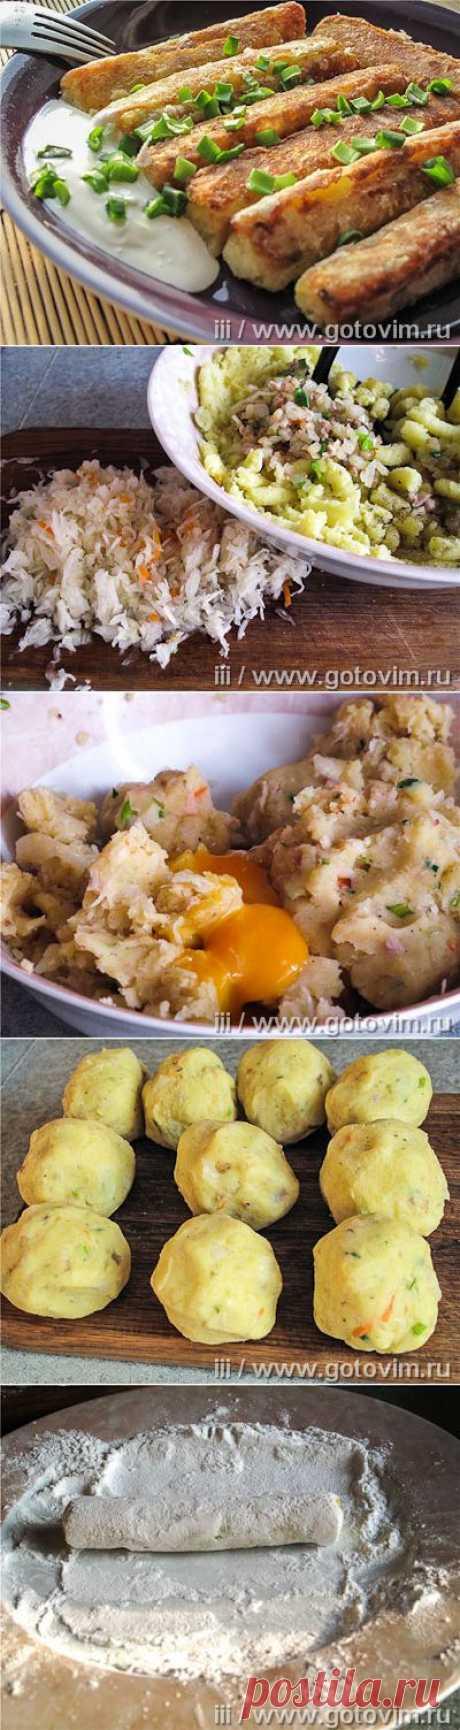 Рыцарские колбаски. Фото-рецепт / Готовим.РУ